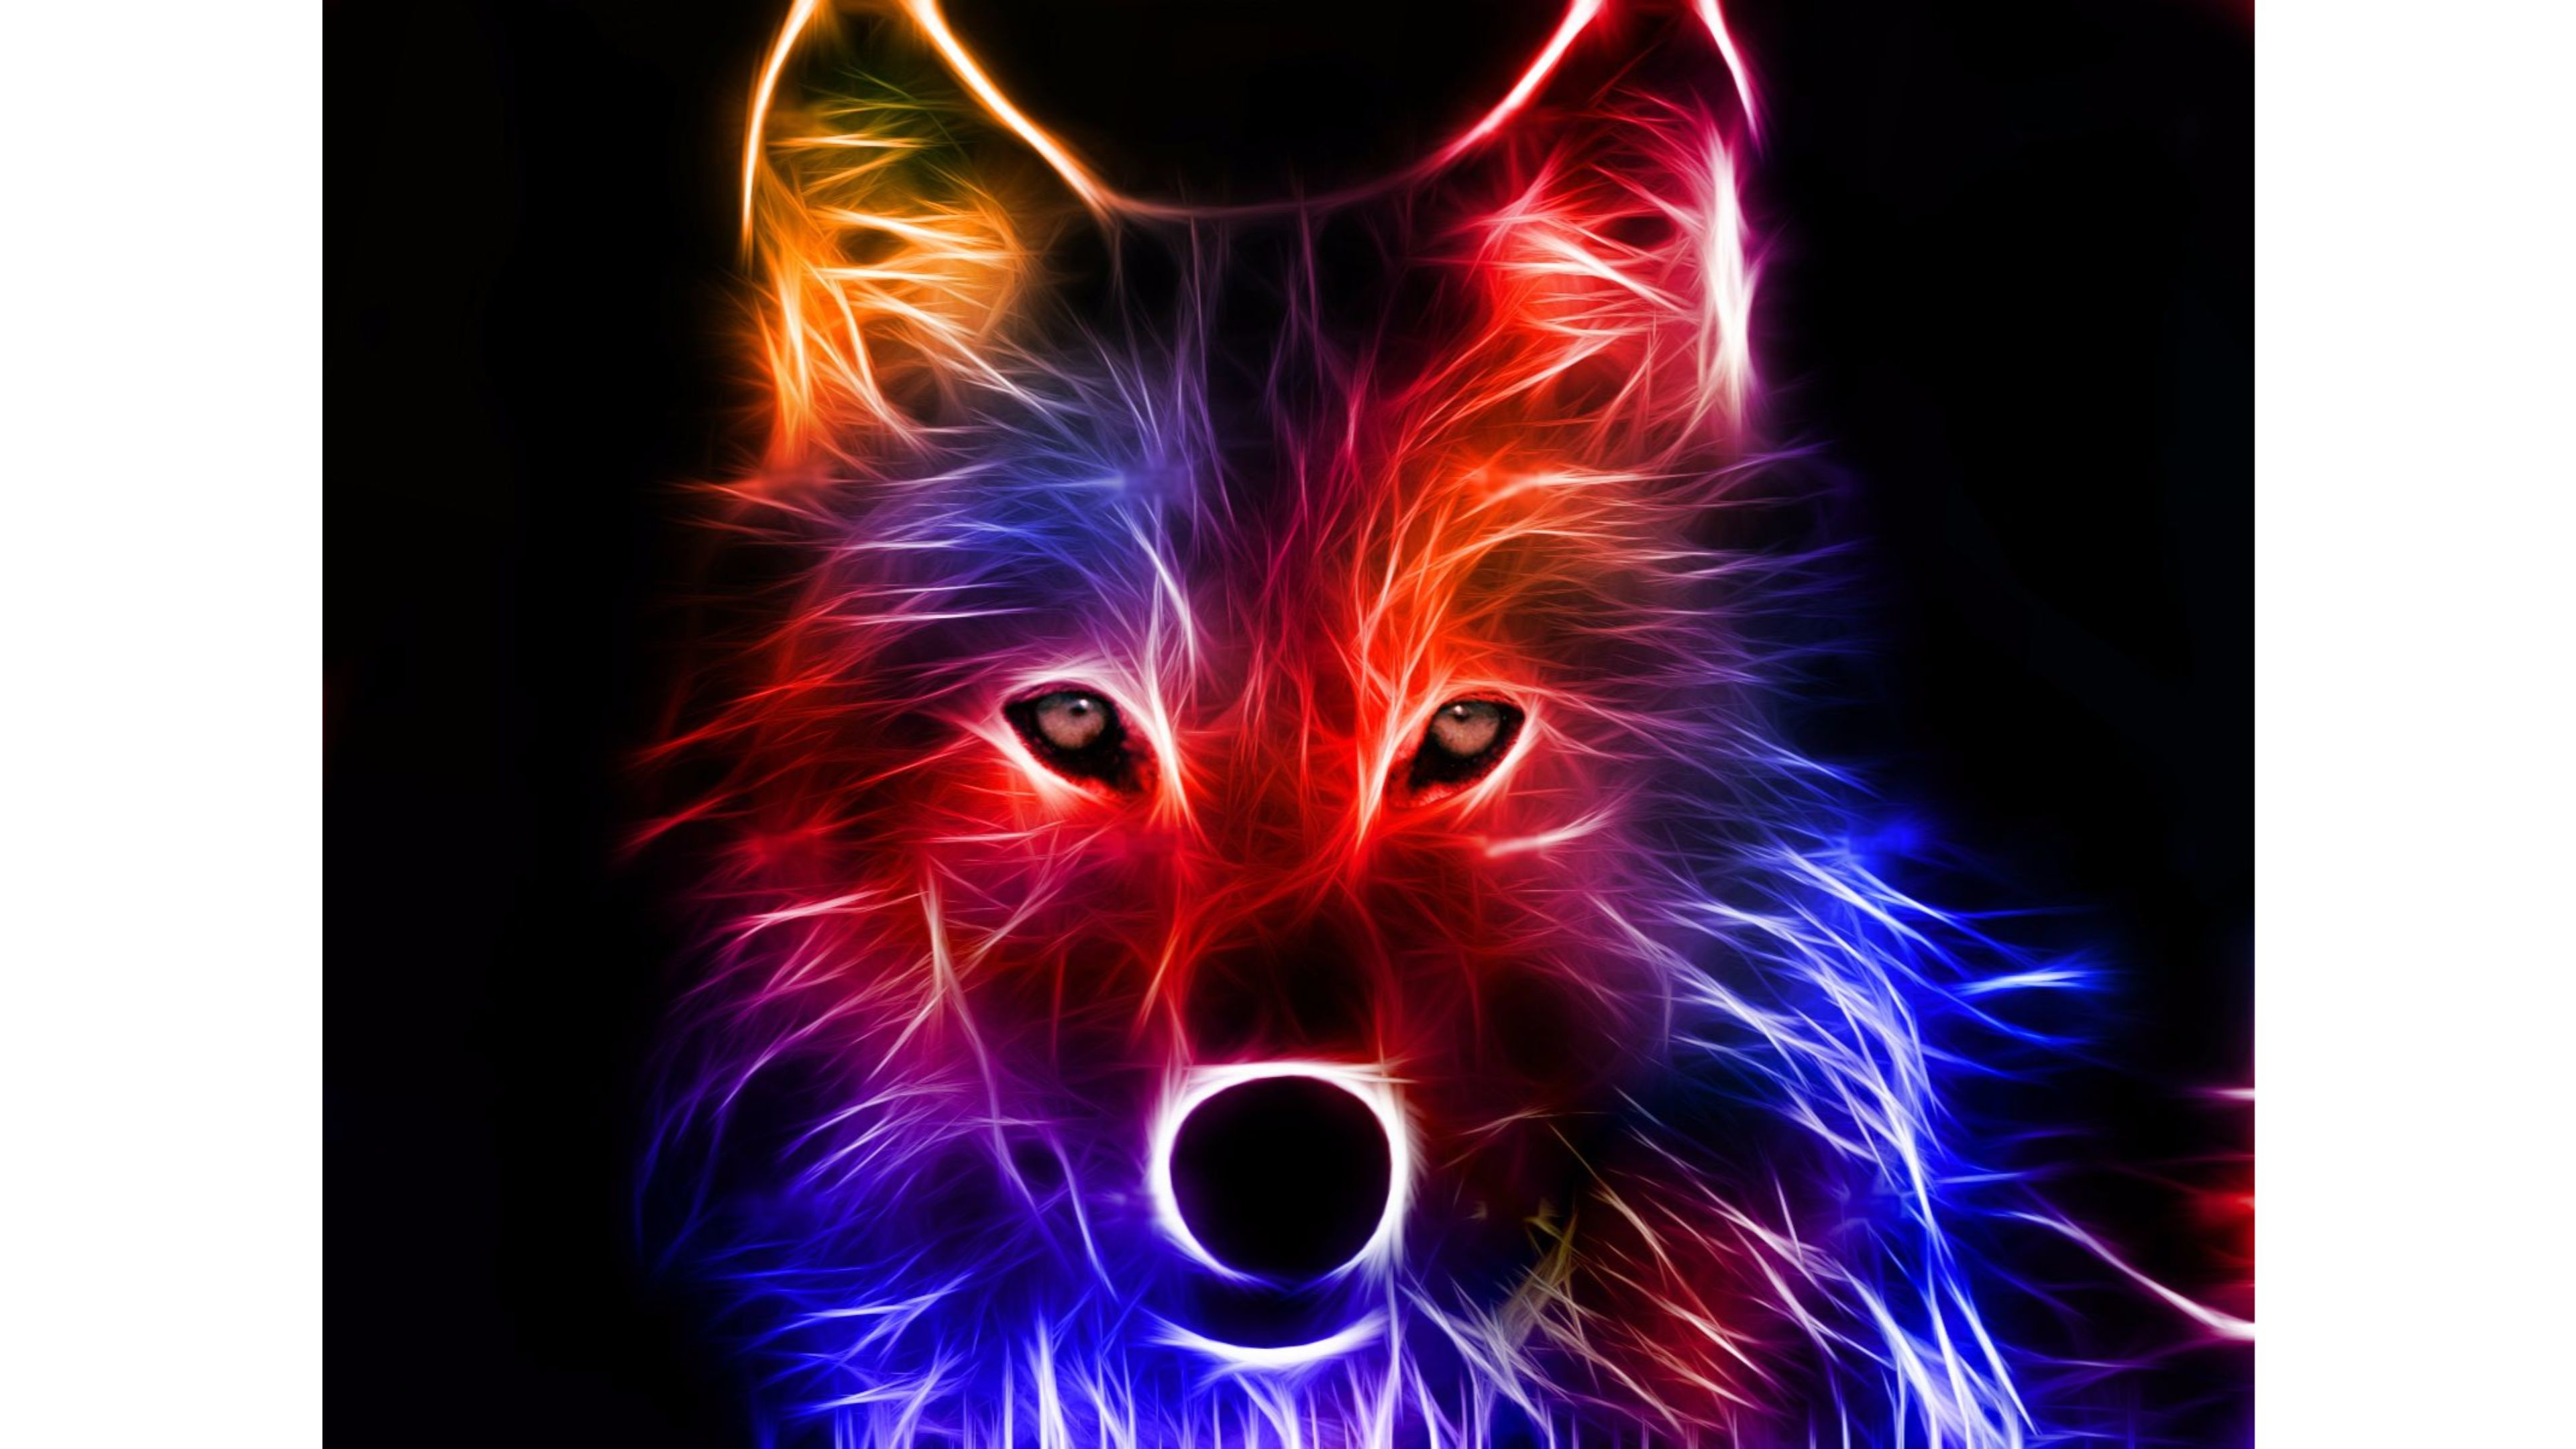 Colored Wolf 3D 4K Wallpaper | Free 4K Wallpaper